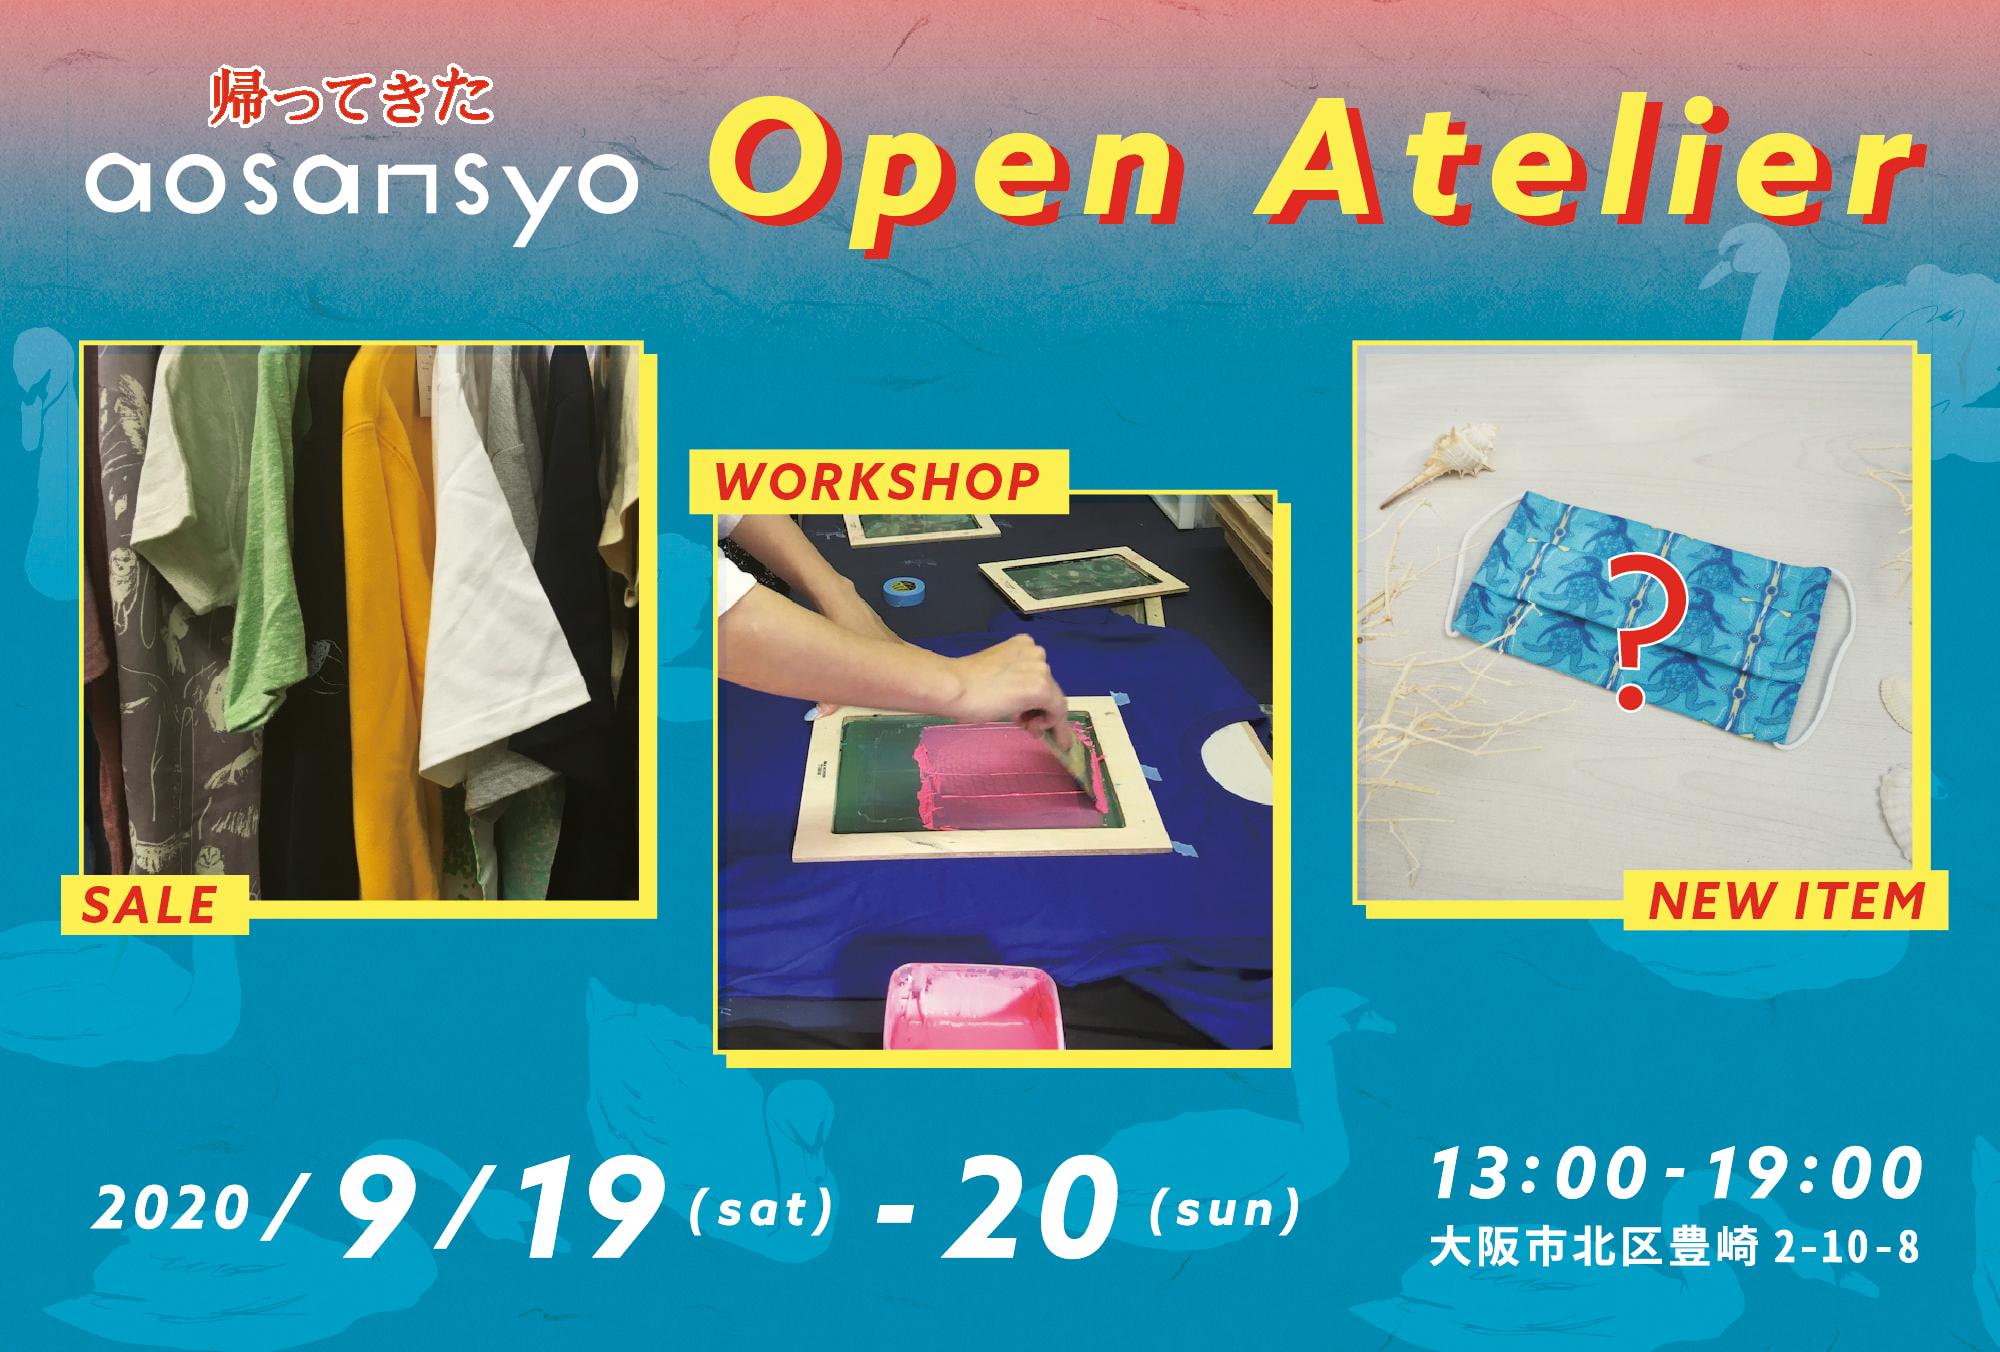 aosansyo オープンアトリエ2020